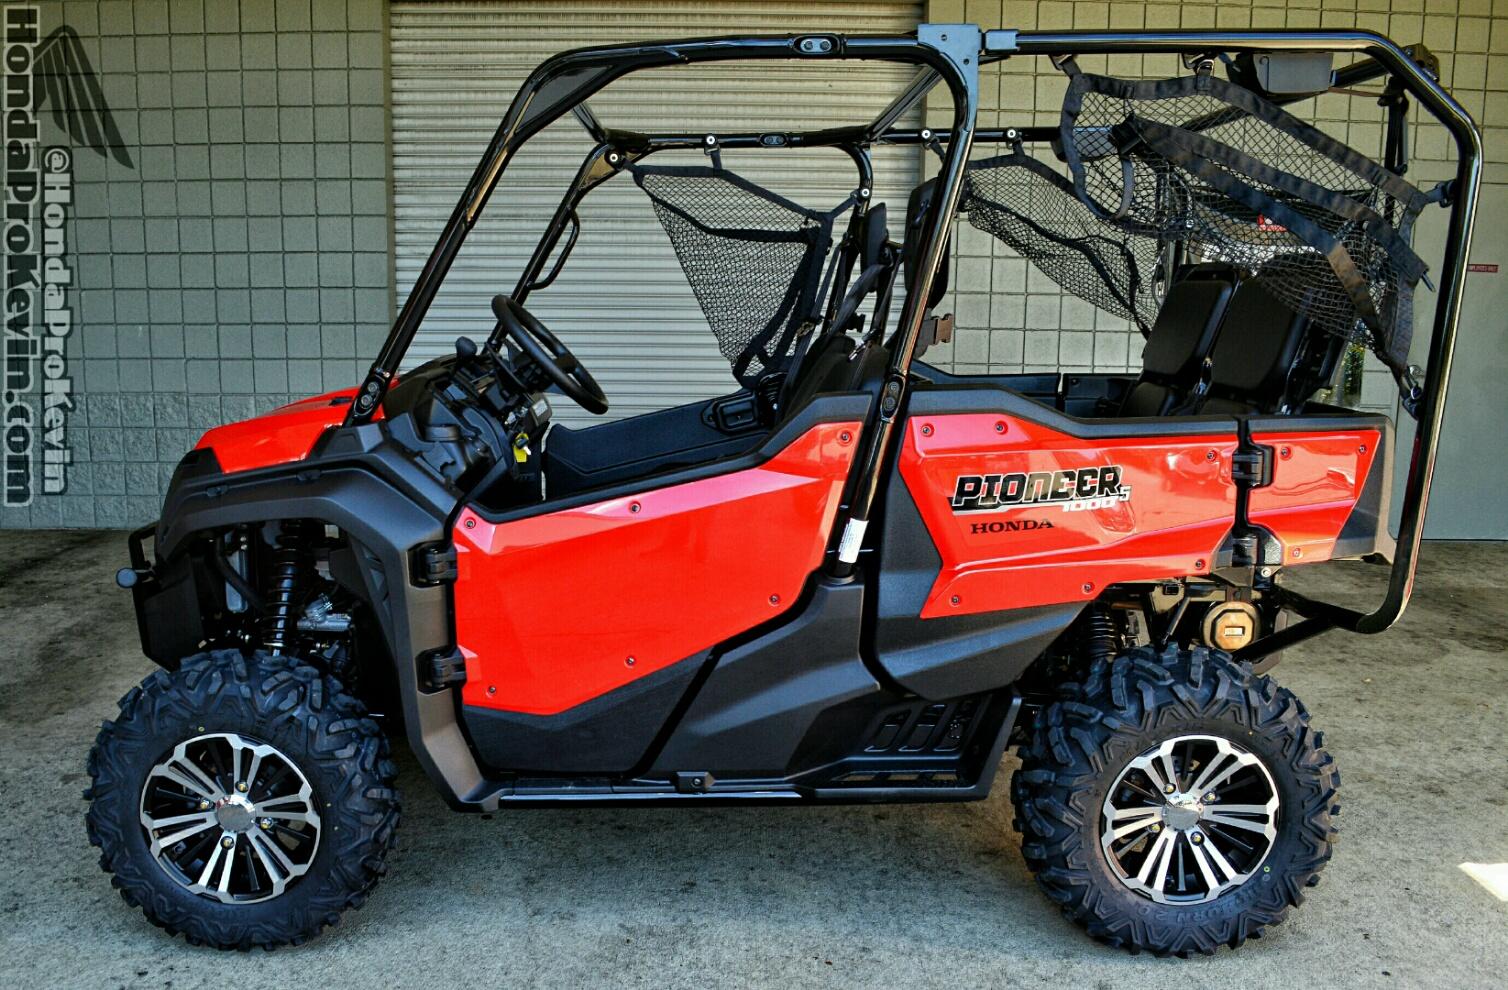 ... Review - All New Honda Side by Side ATV / UTV / SxS | Honda-Pro Kevin